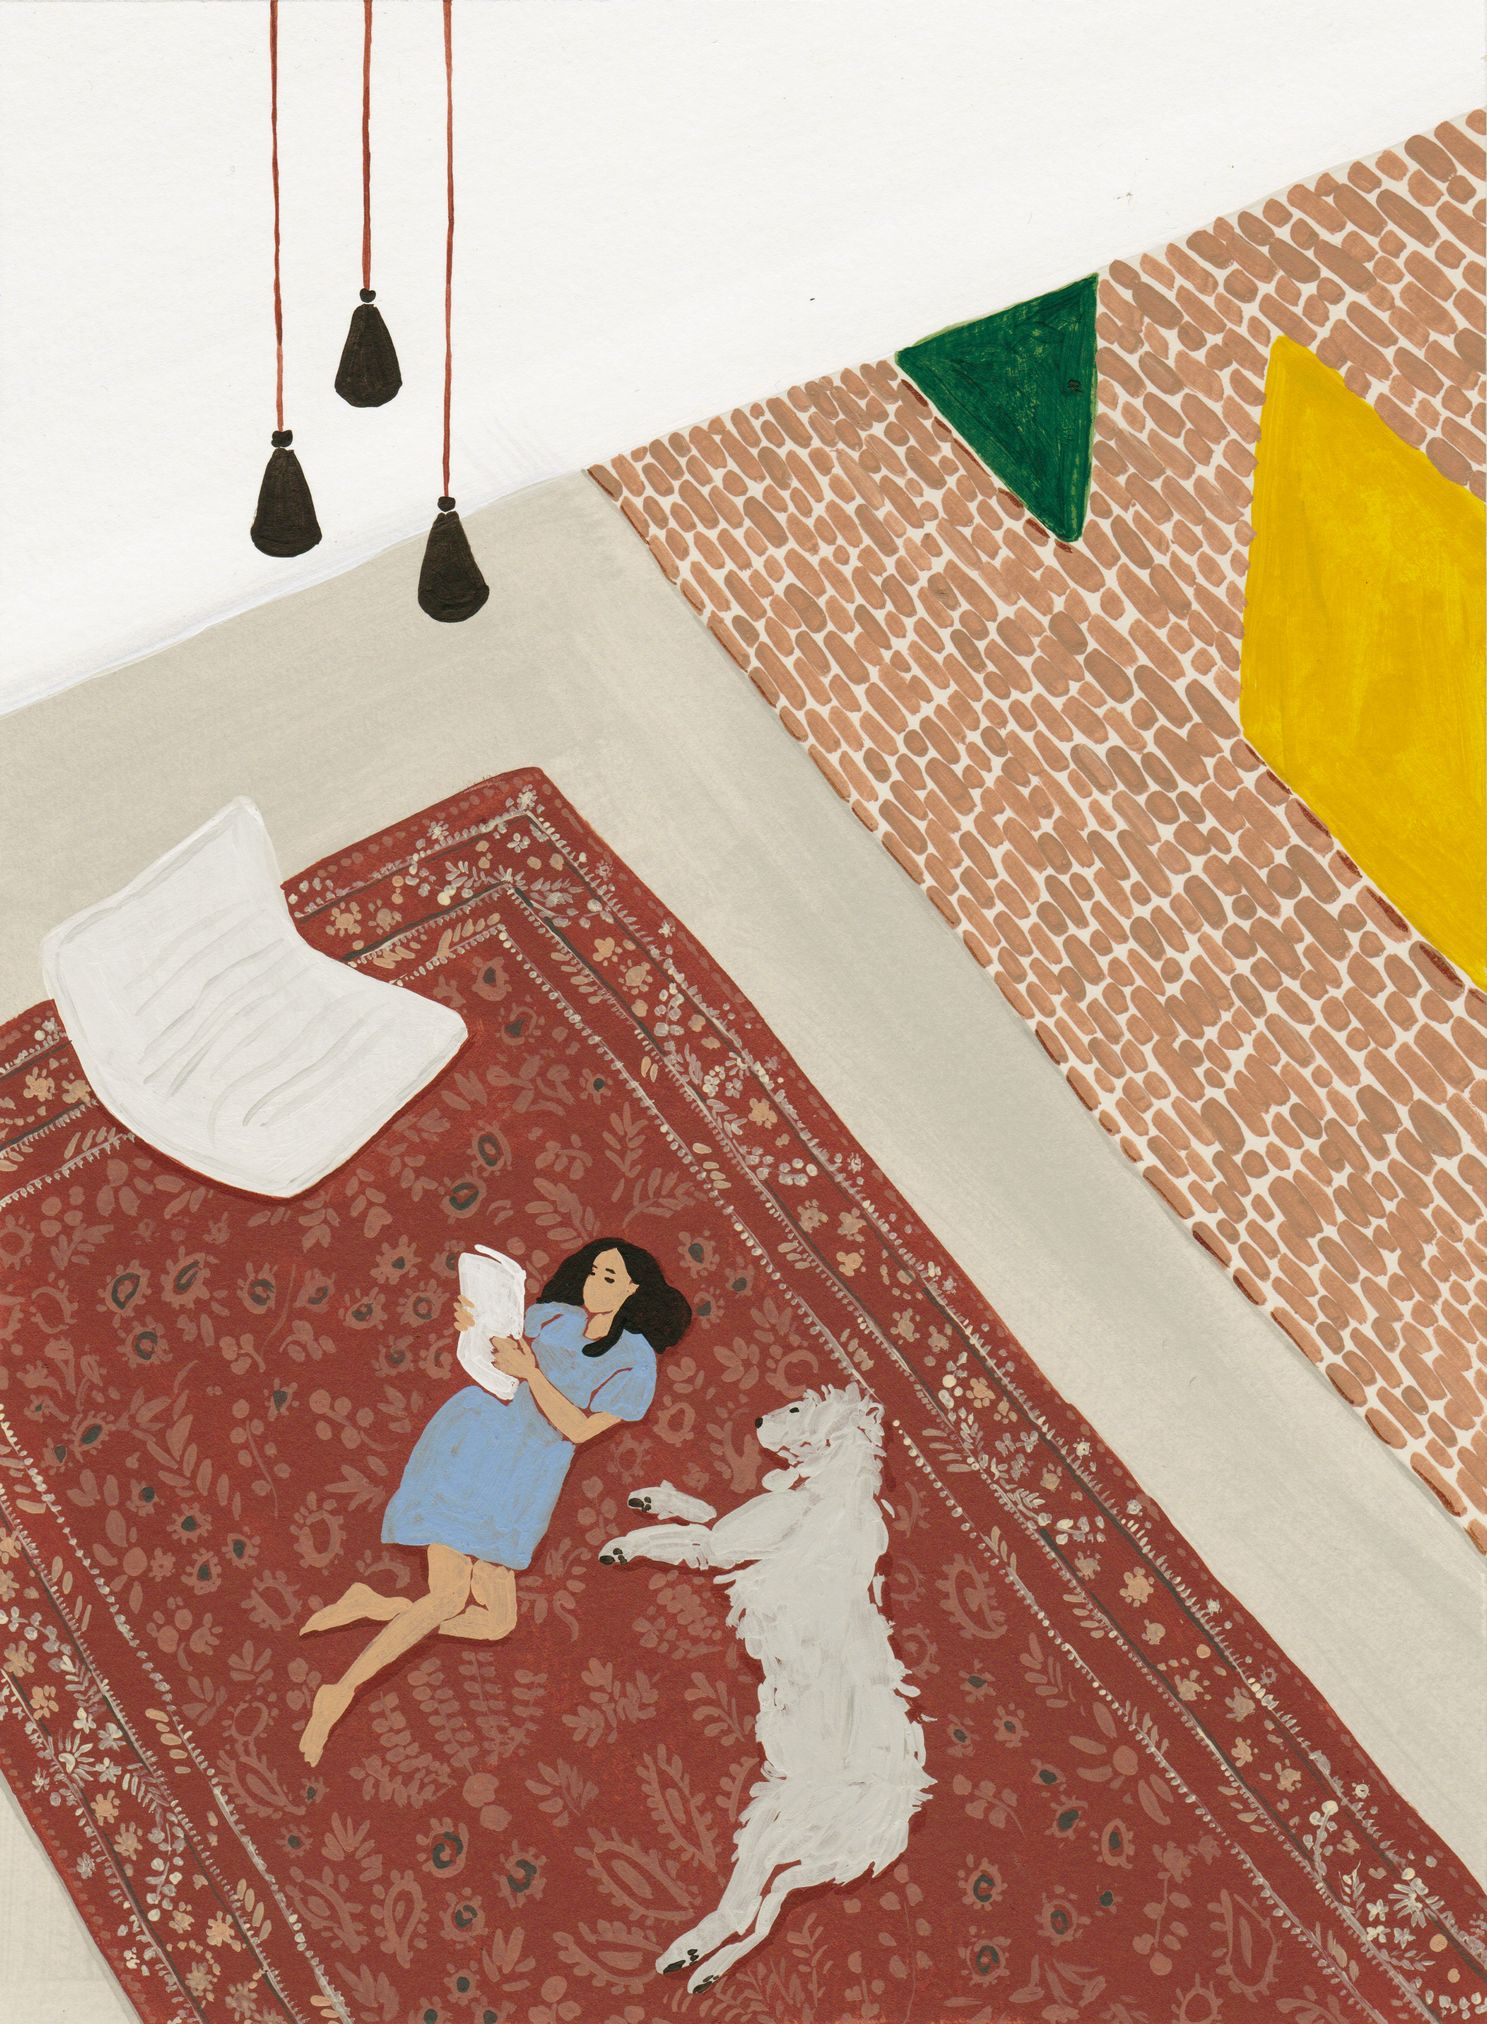 garance-illustration-Yukiko-Noritake-Projet-perso_35_Interieur_web